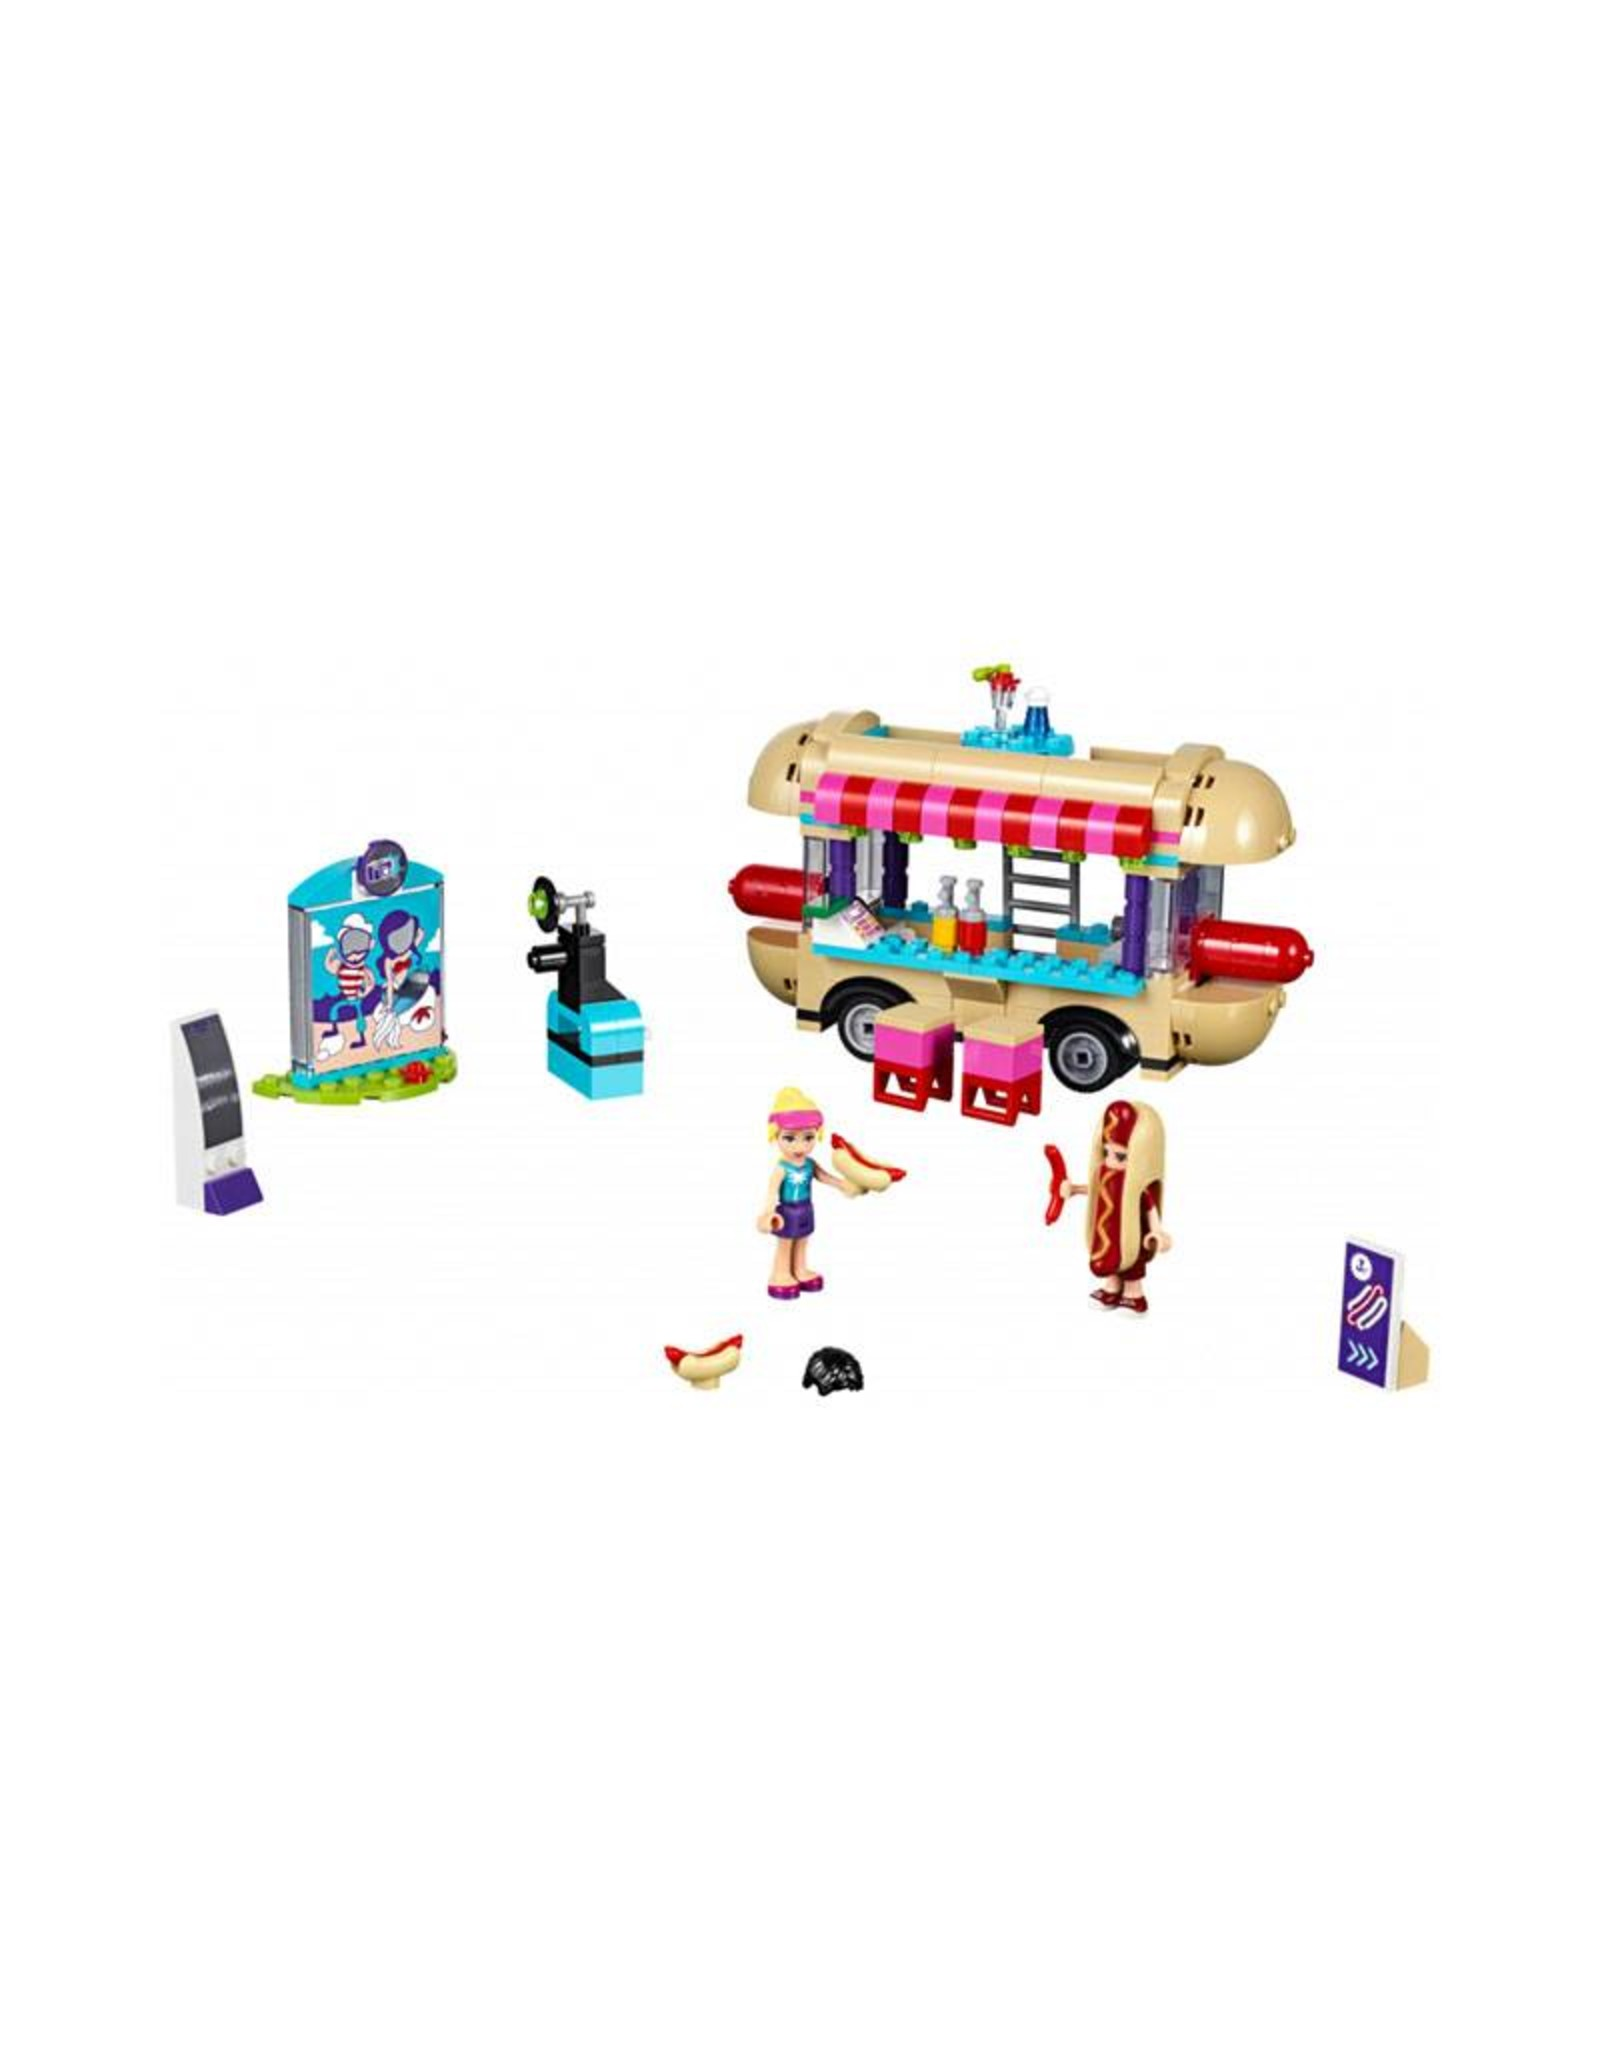 LEGO LEGO 41129 Amusement Park Hot Dog Van FRIENDS